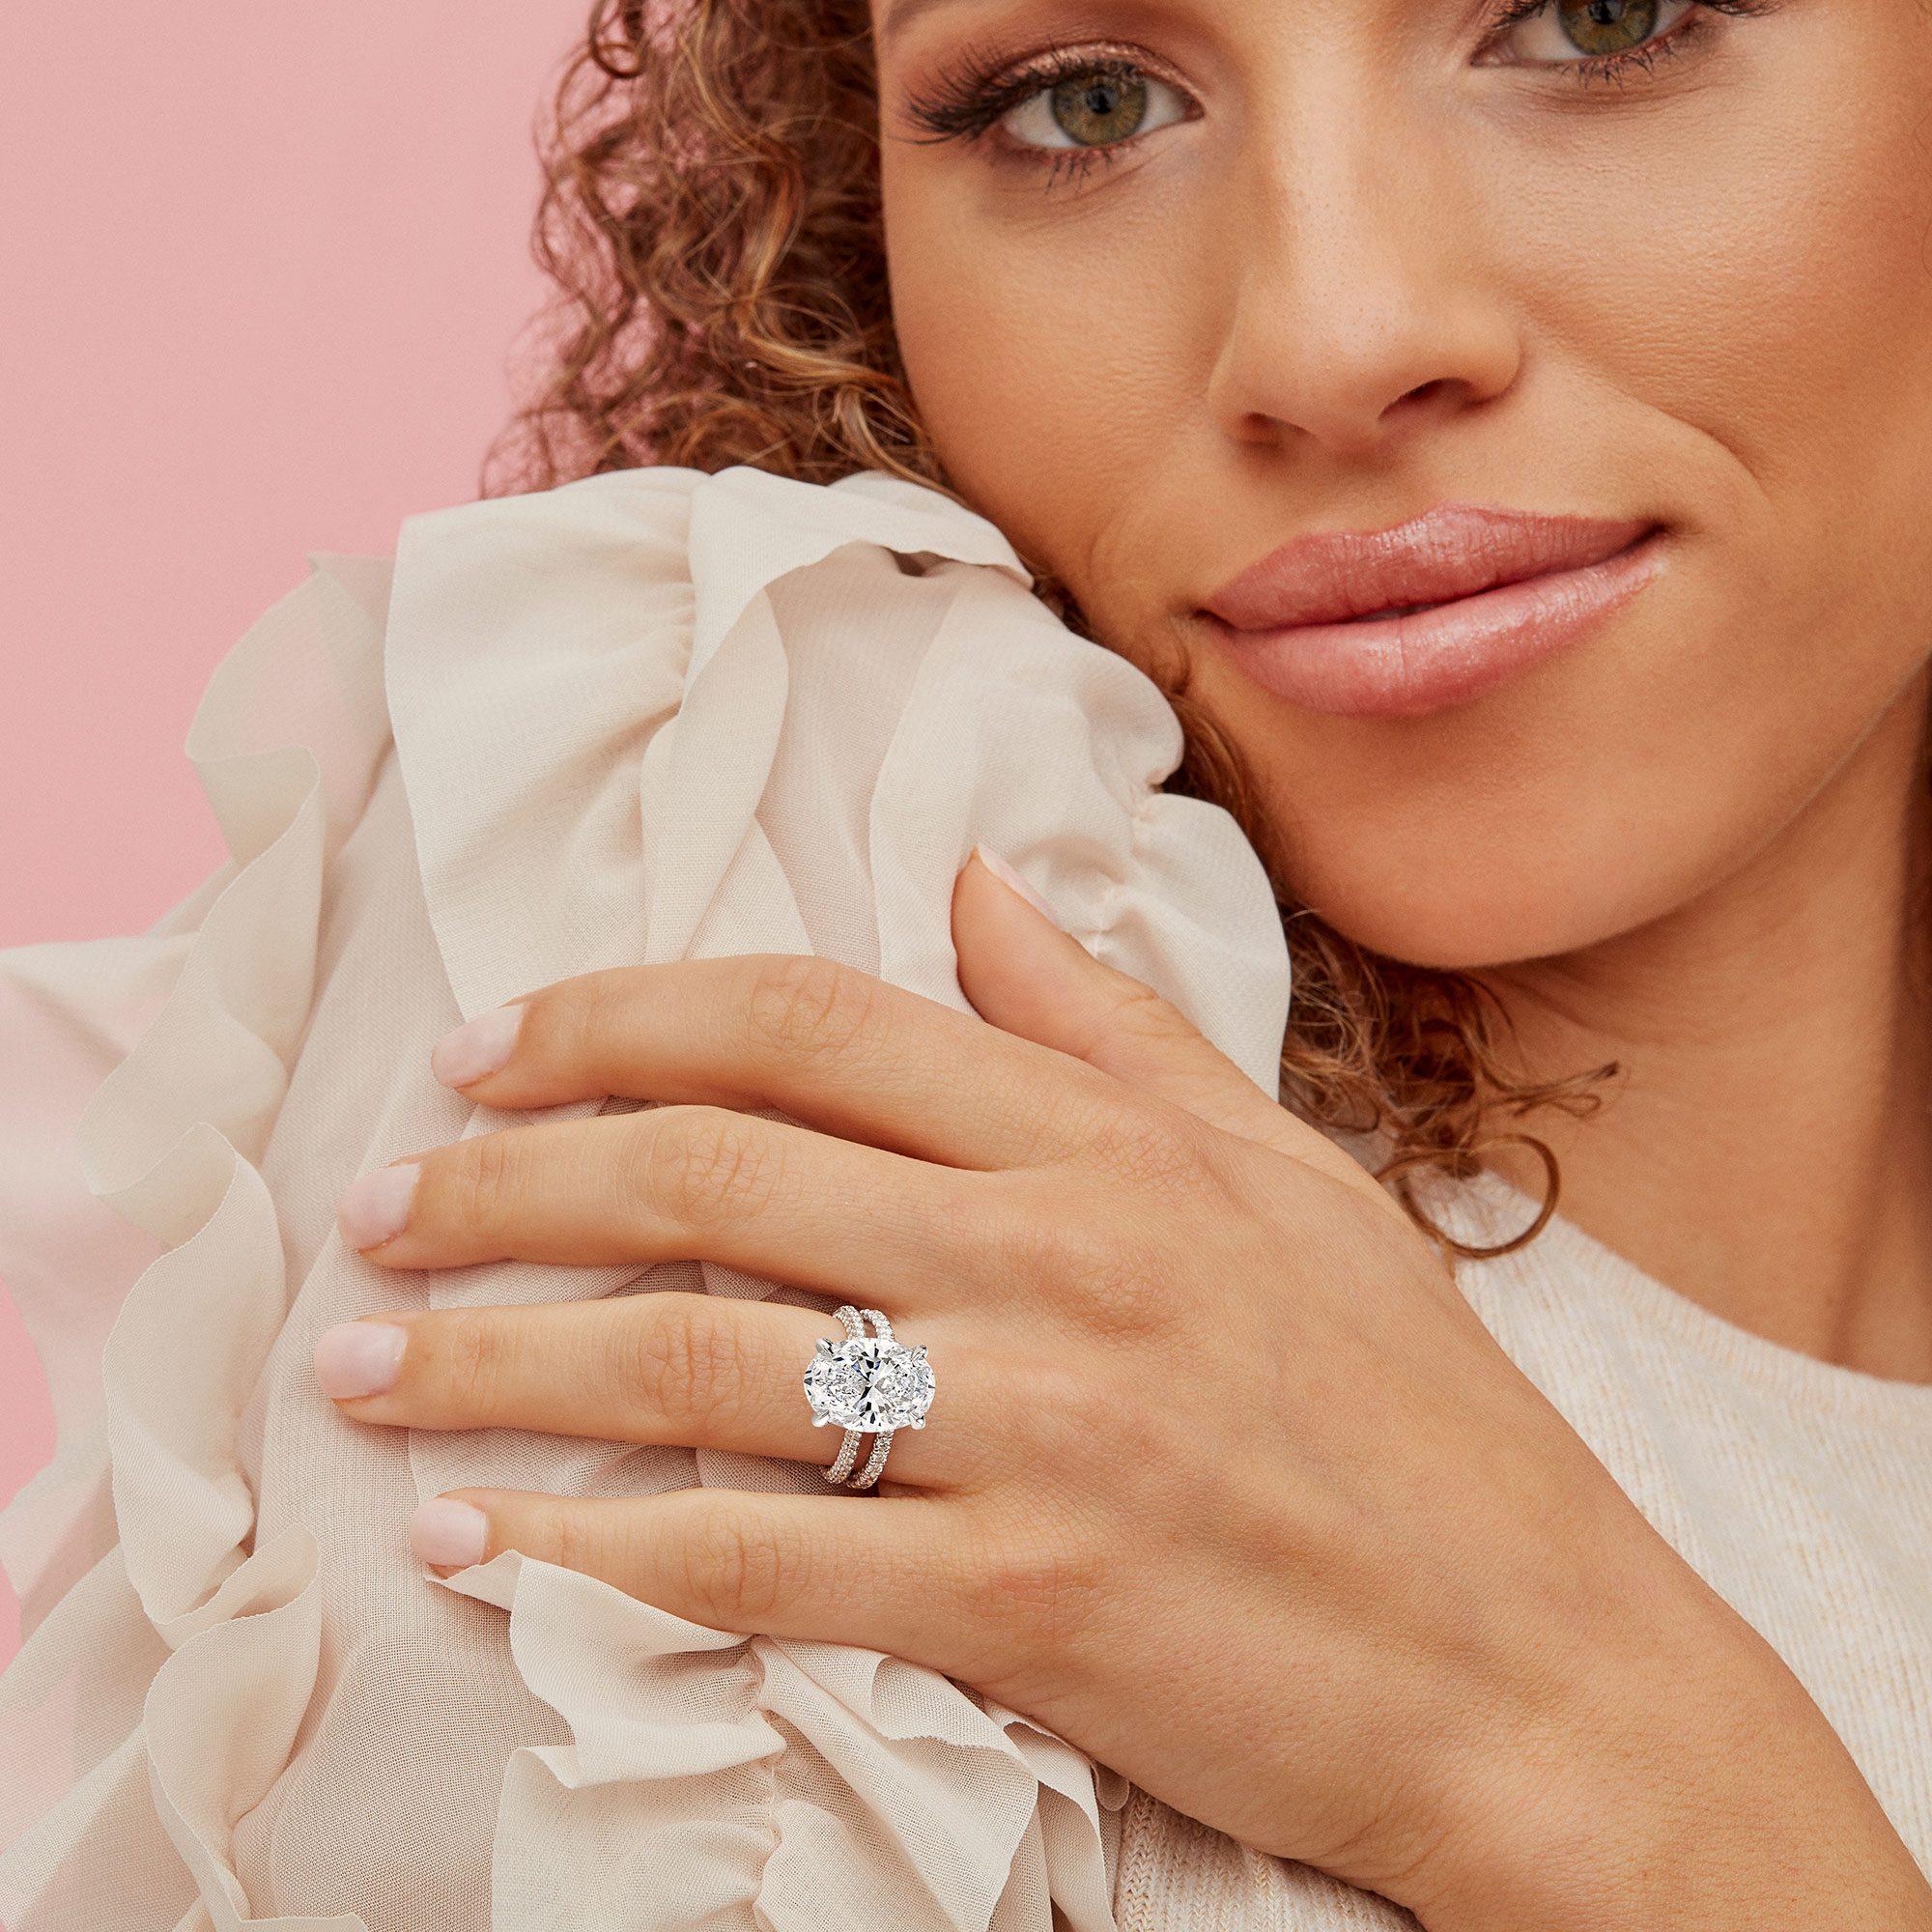 Jacqueline Oval Lab Grown Diamond Ring on Hand Model